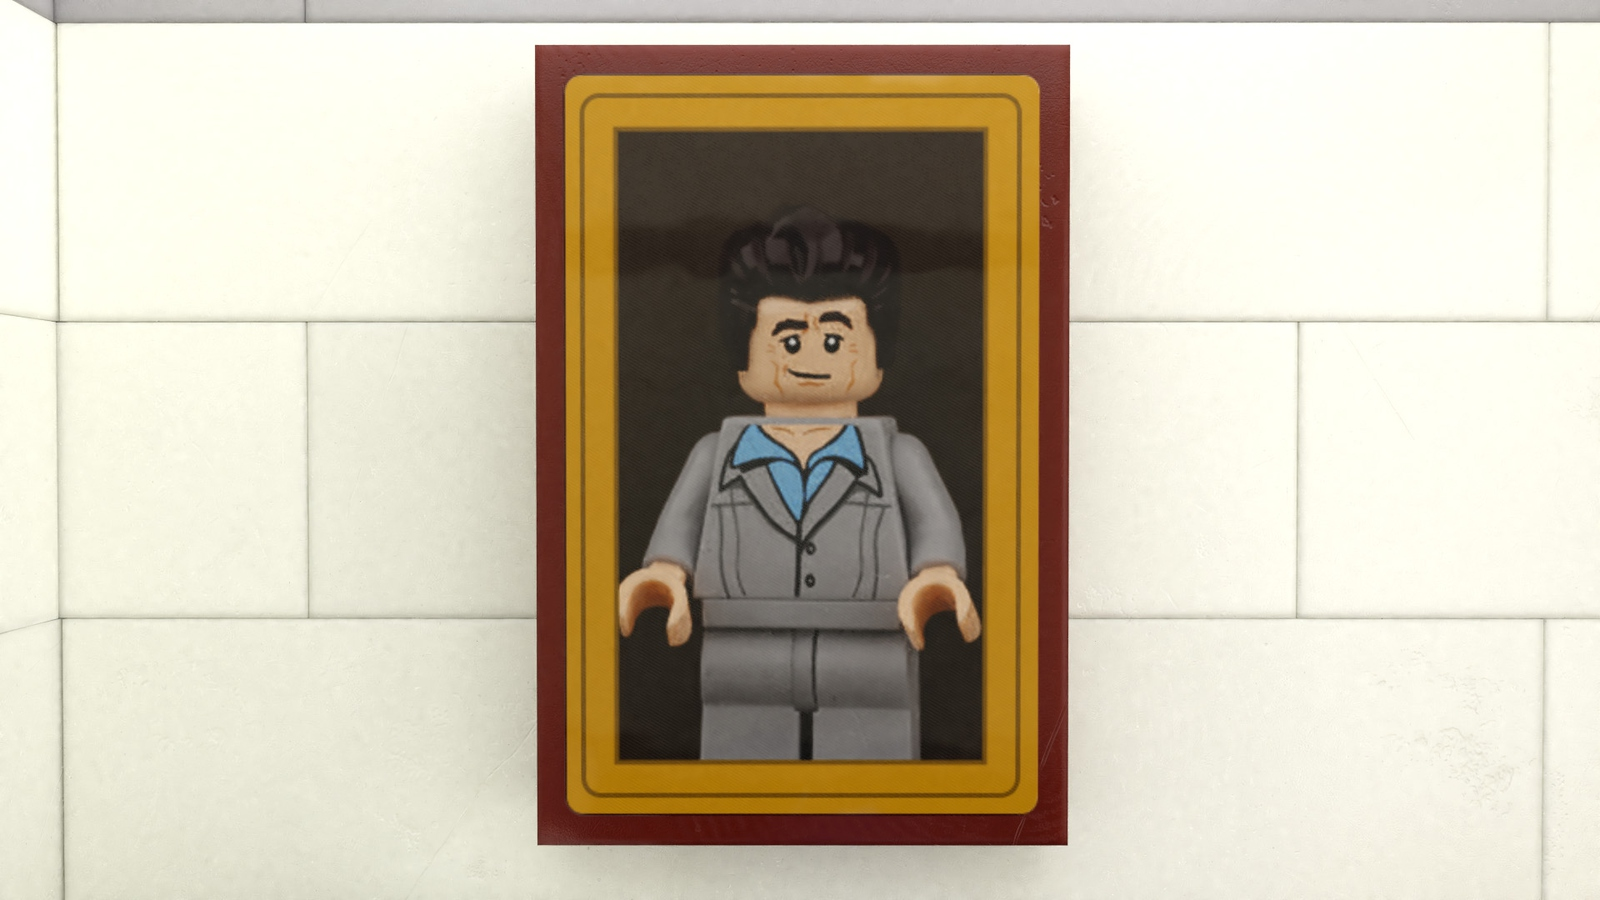 Cosmo Kramer LEGO Portrait